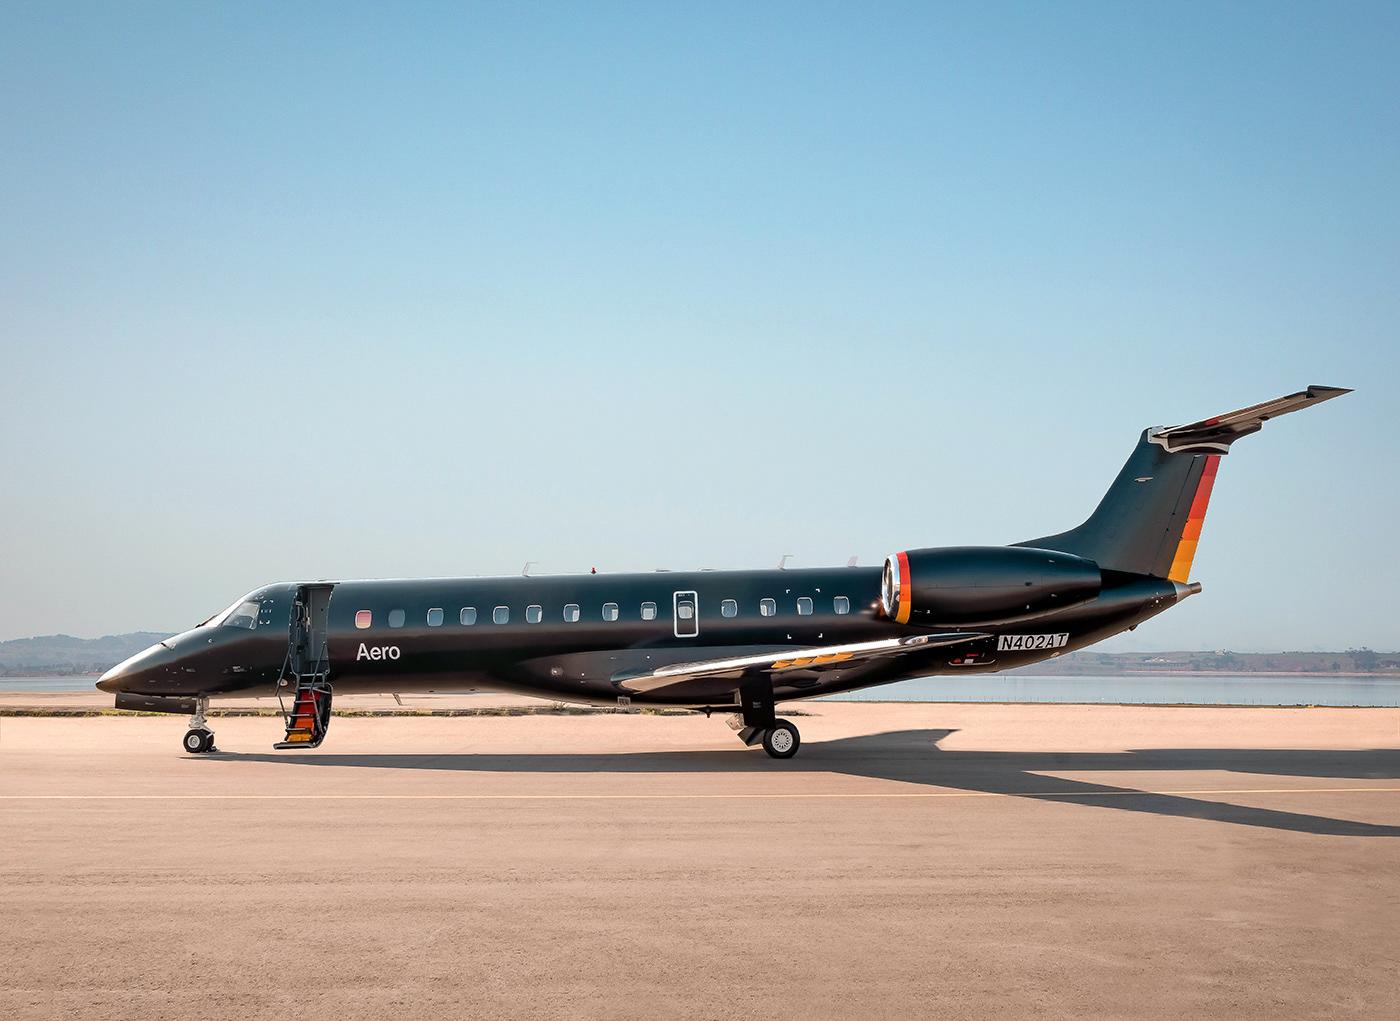 aero air travel airline brand identity branding  livery design luxury oddone san francisco visual identity